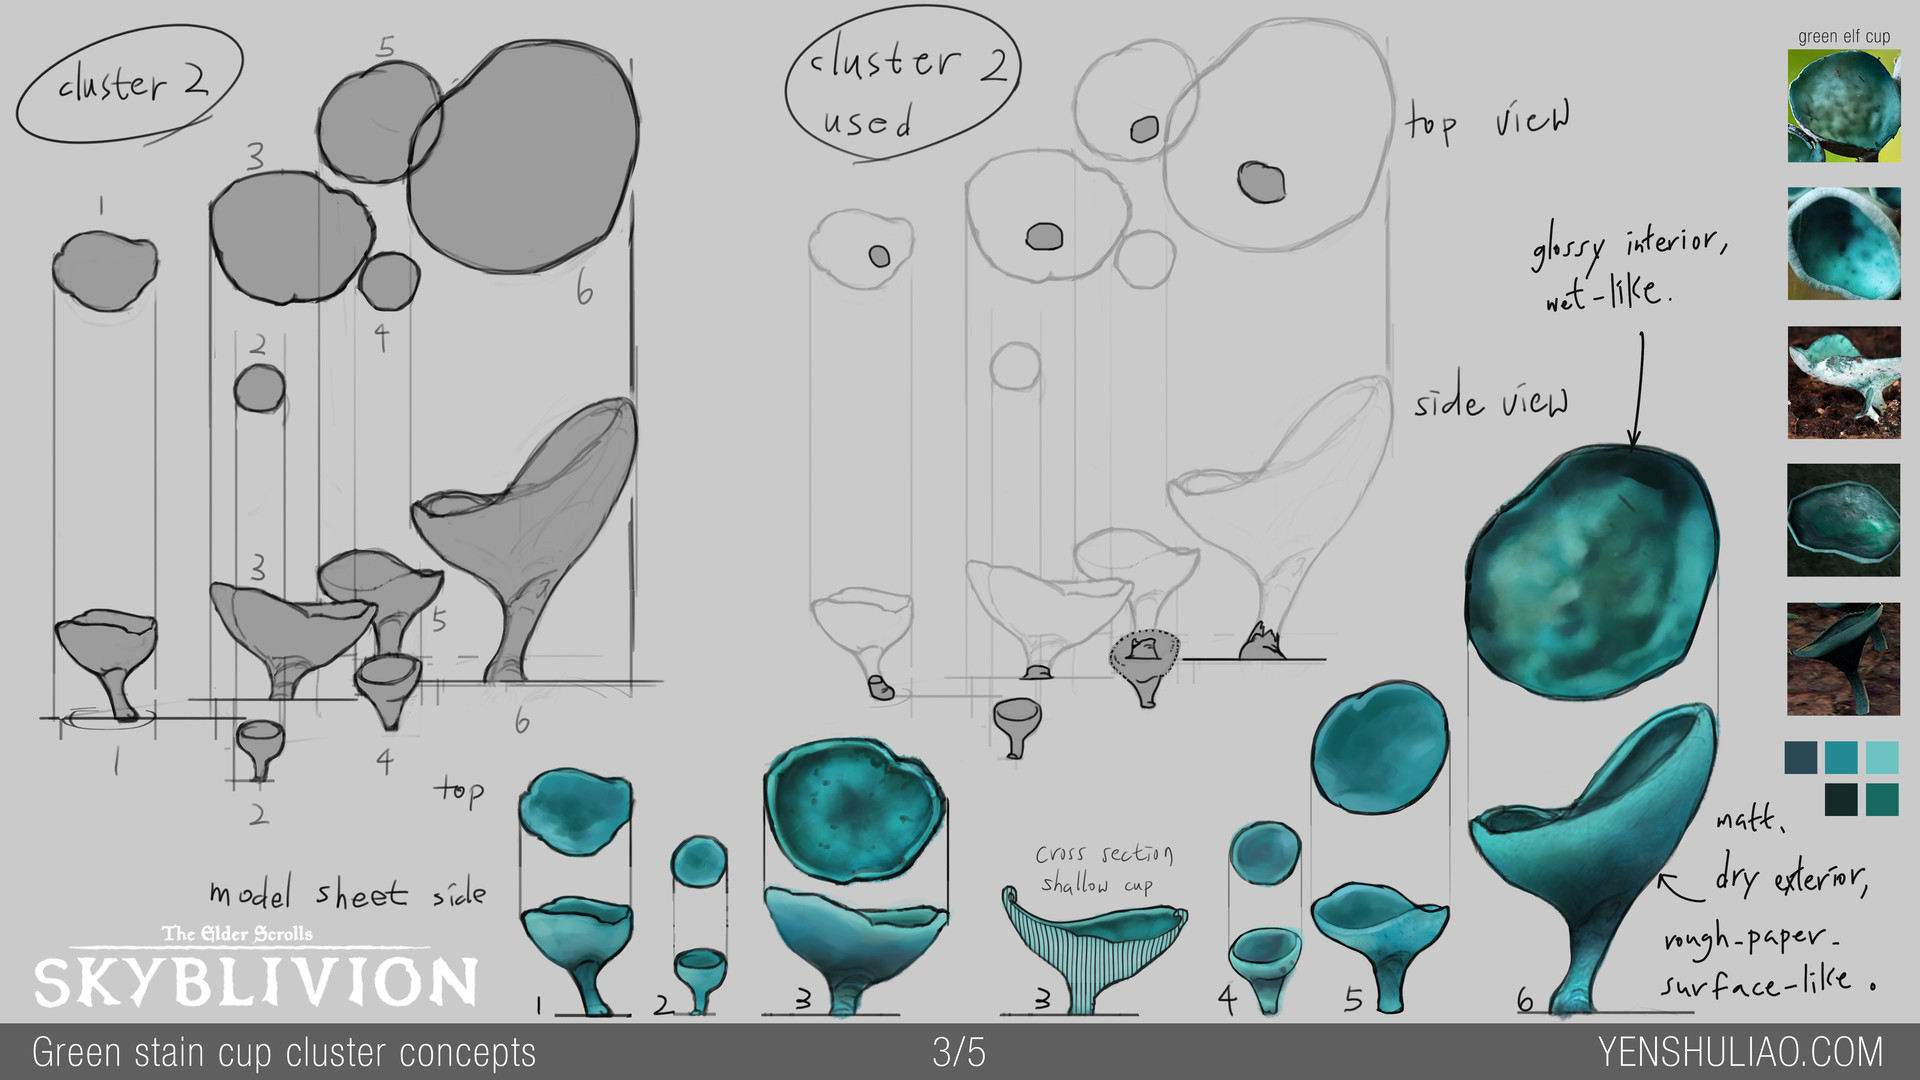 Yen shu liao mushroom environment prop concept yen shu liao skyblivion greenstaincap 03